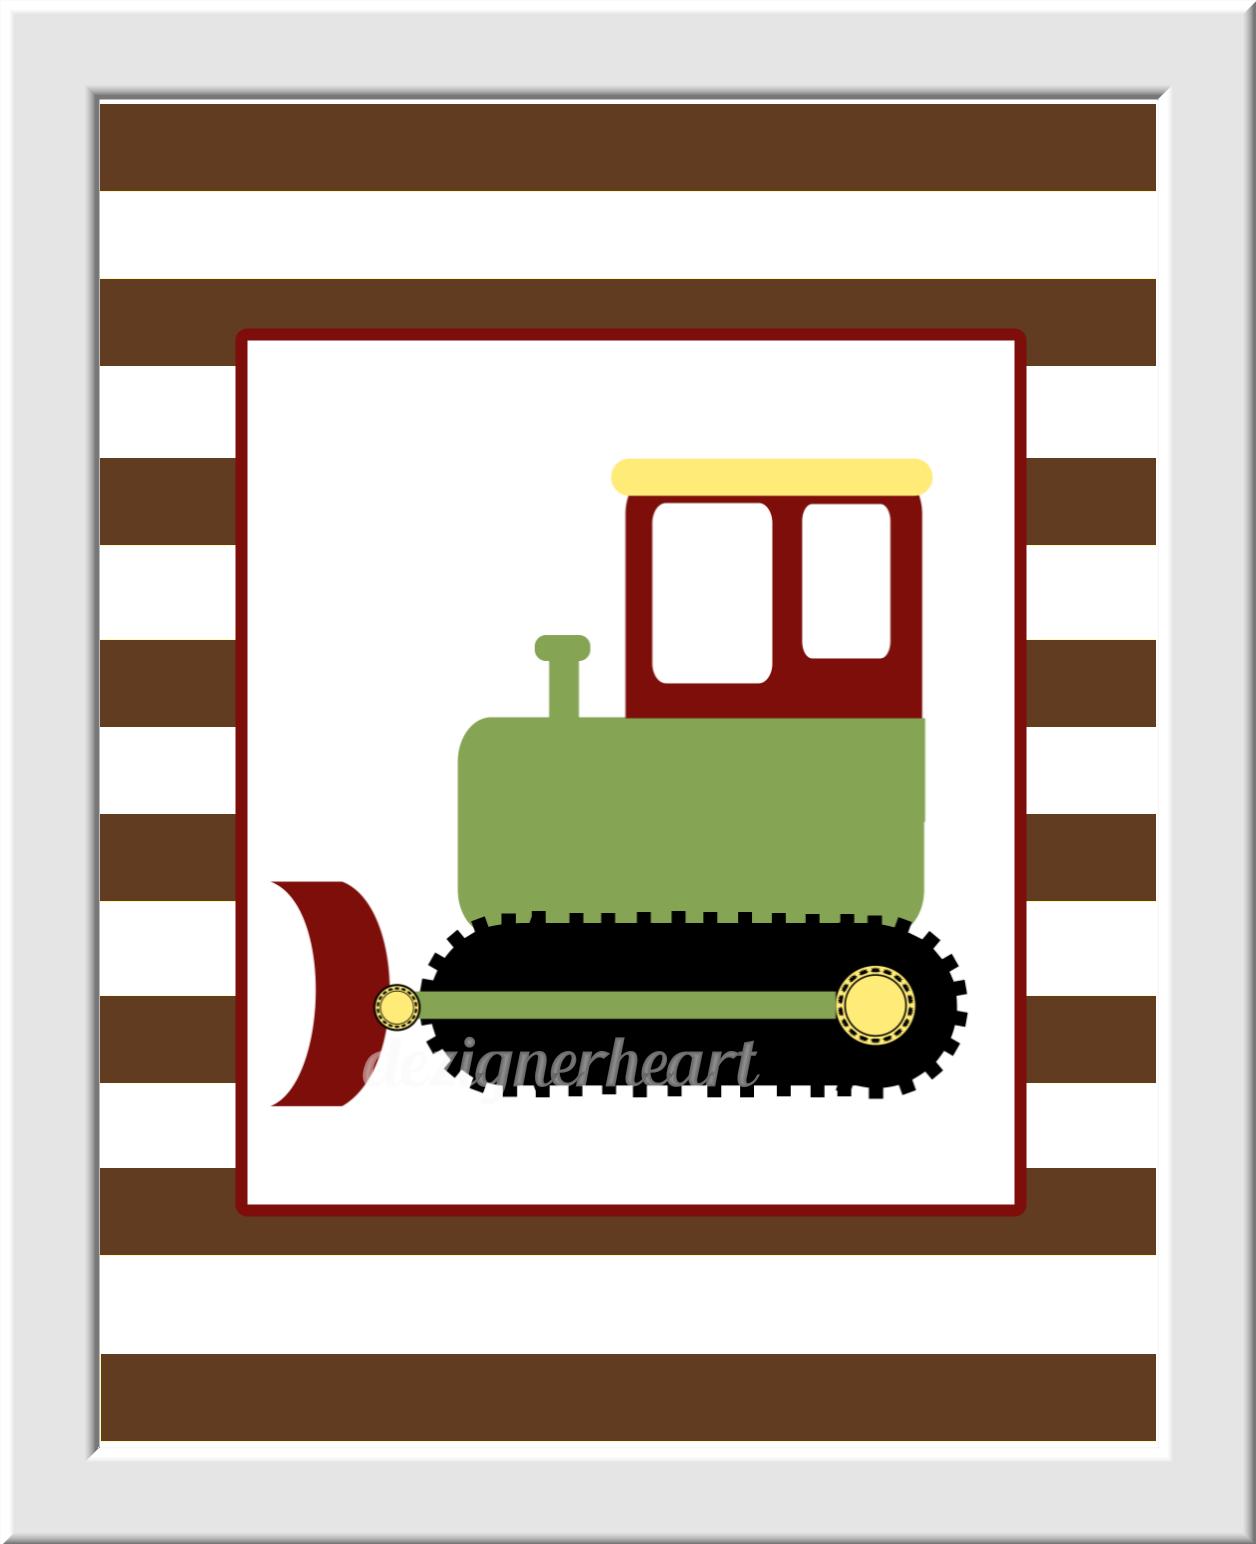 CONSTRUCTION Trucks Baby Boy Nursery Art Yellow Green Brown Blue Red Dump Truck Cement Tractor Construction Bedding Builder Decor Baby Boy Decor Nursery Wall Art Boys Room Prints Baby Nursery Decor